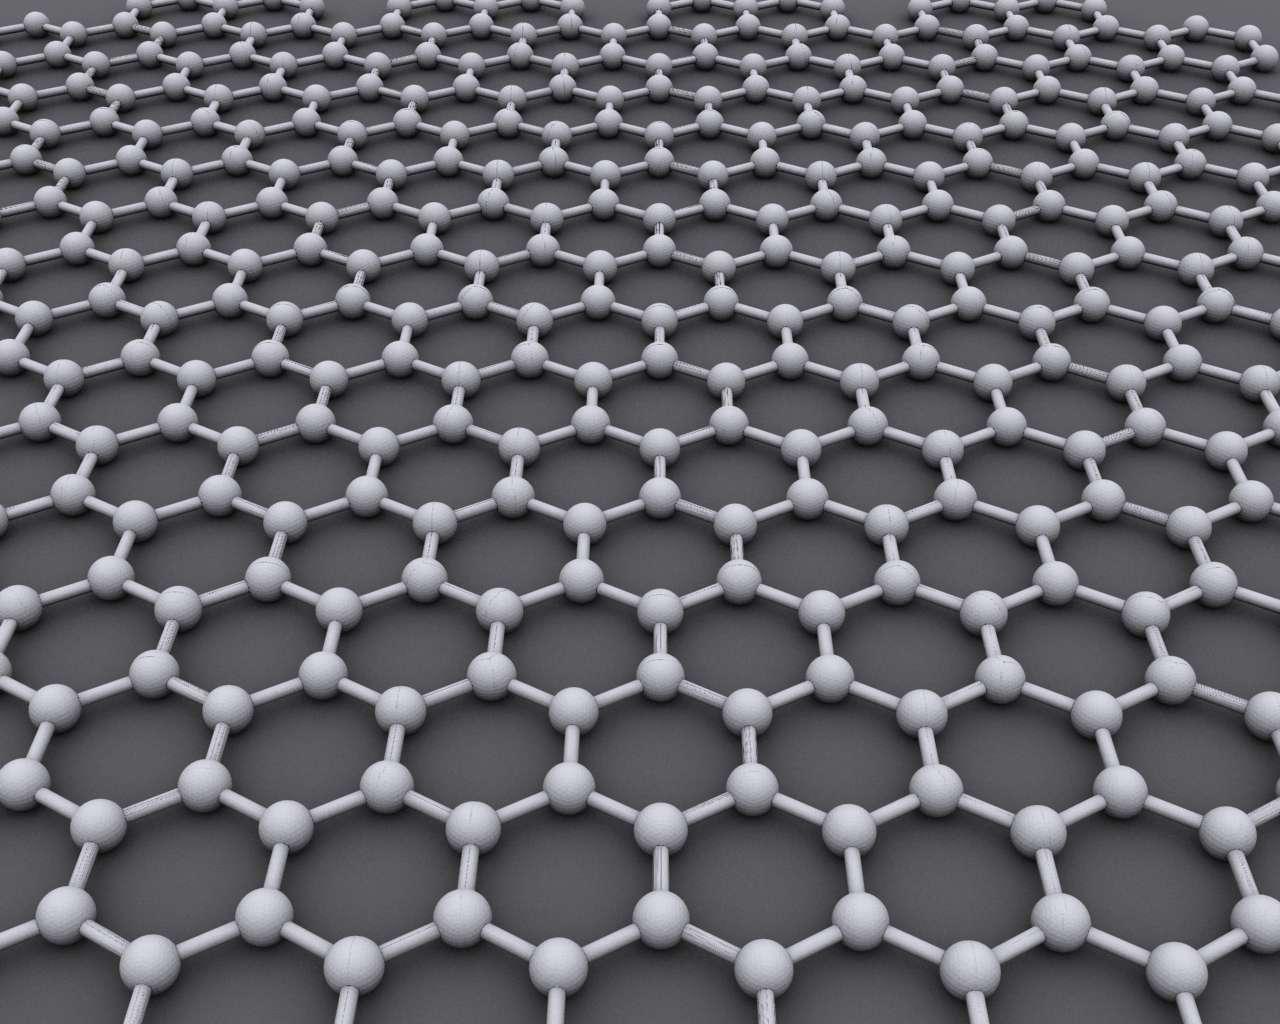 hexagonal graphene lattice